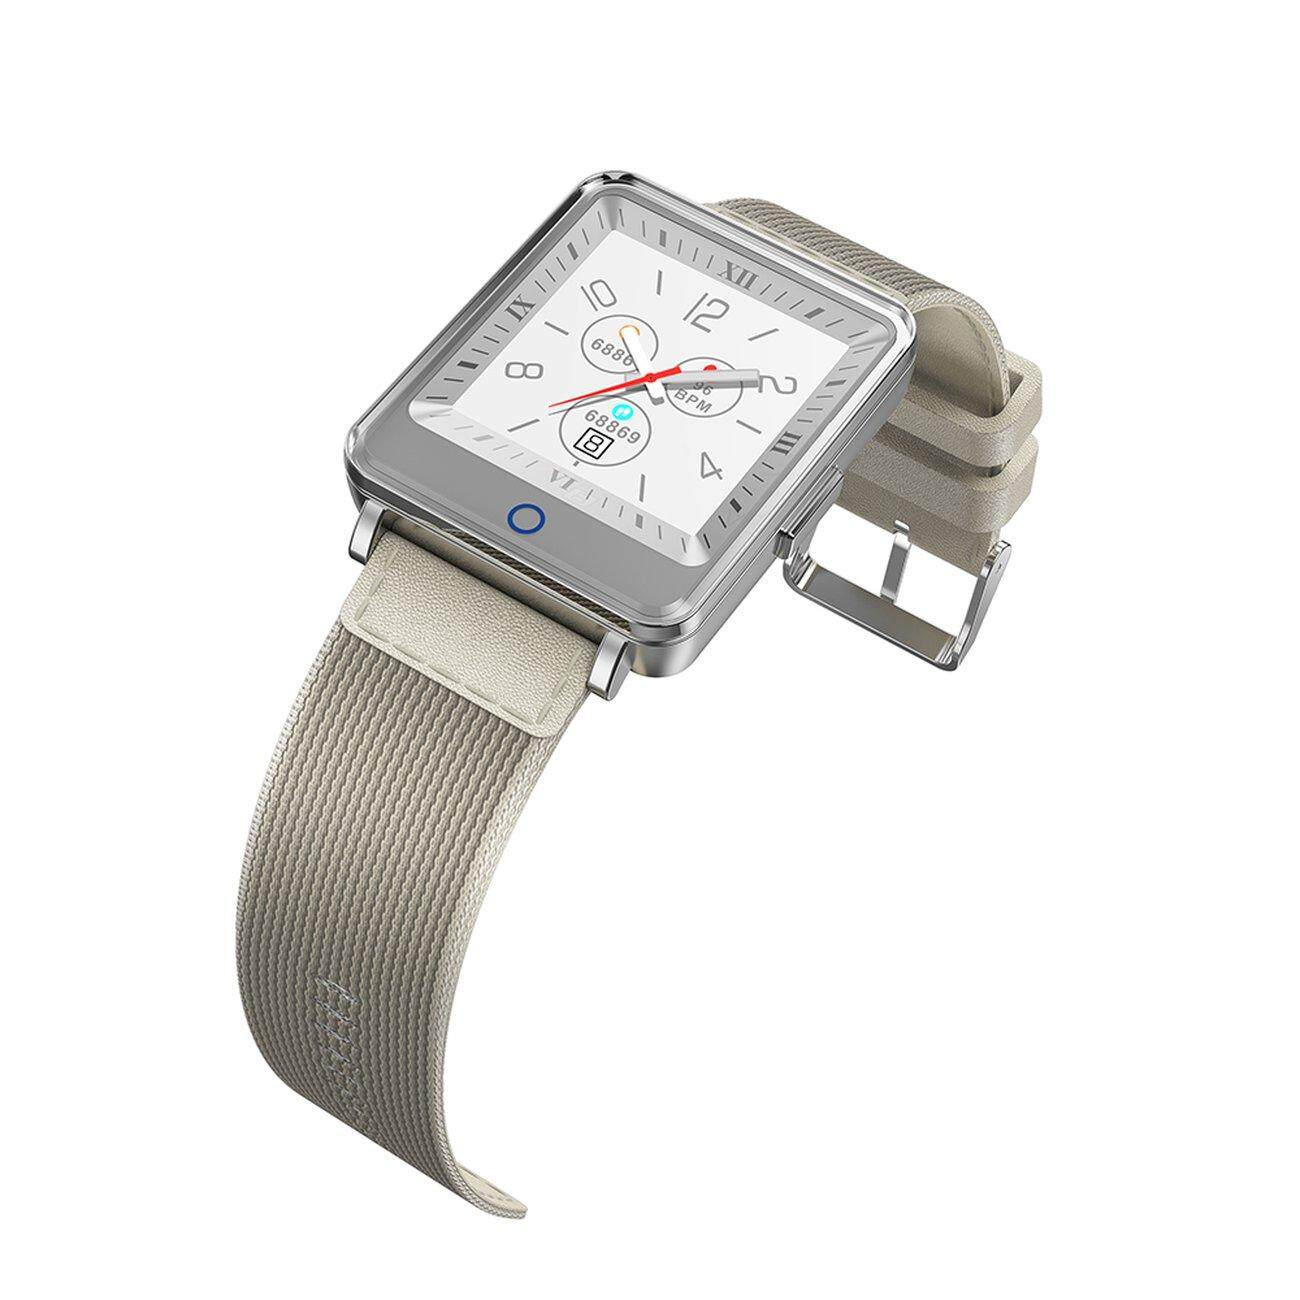 Hot Deals Business Style Designed For Business People V16 Dual-screen Smart Bracelet